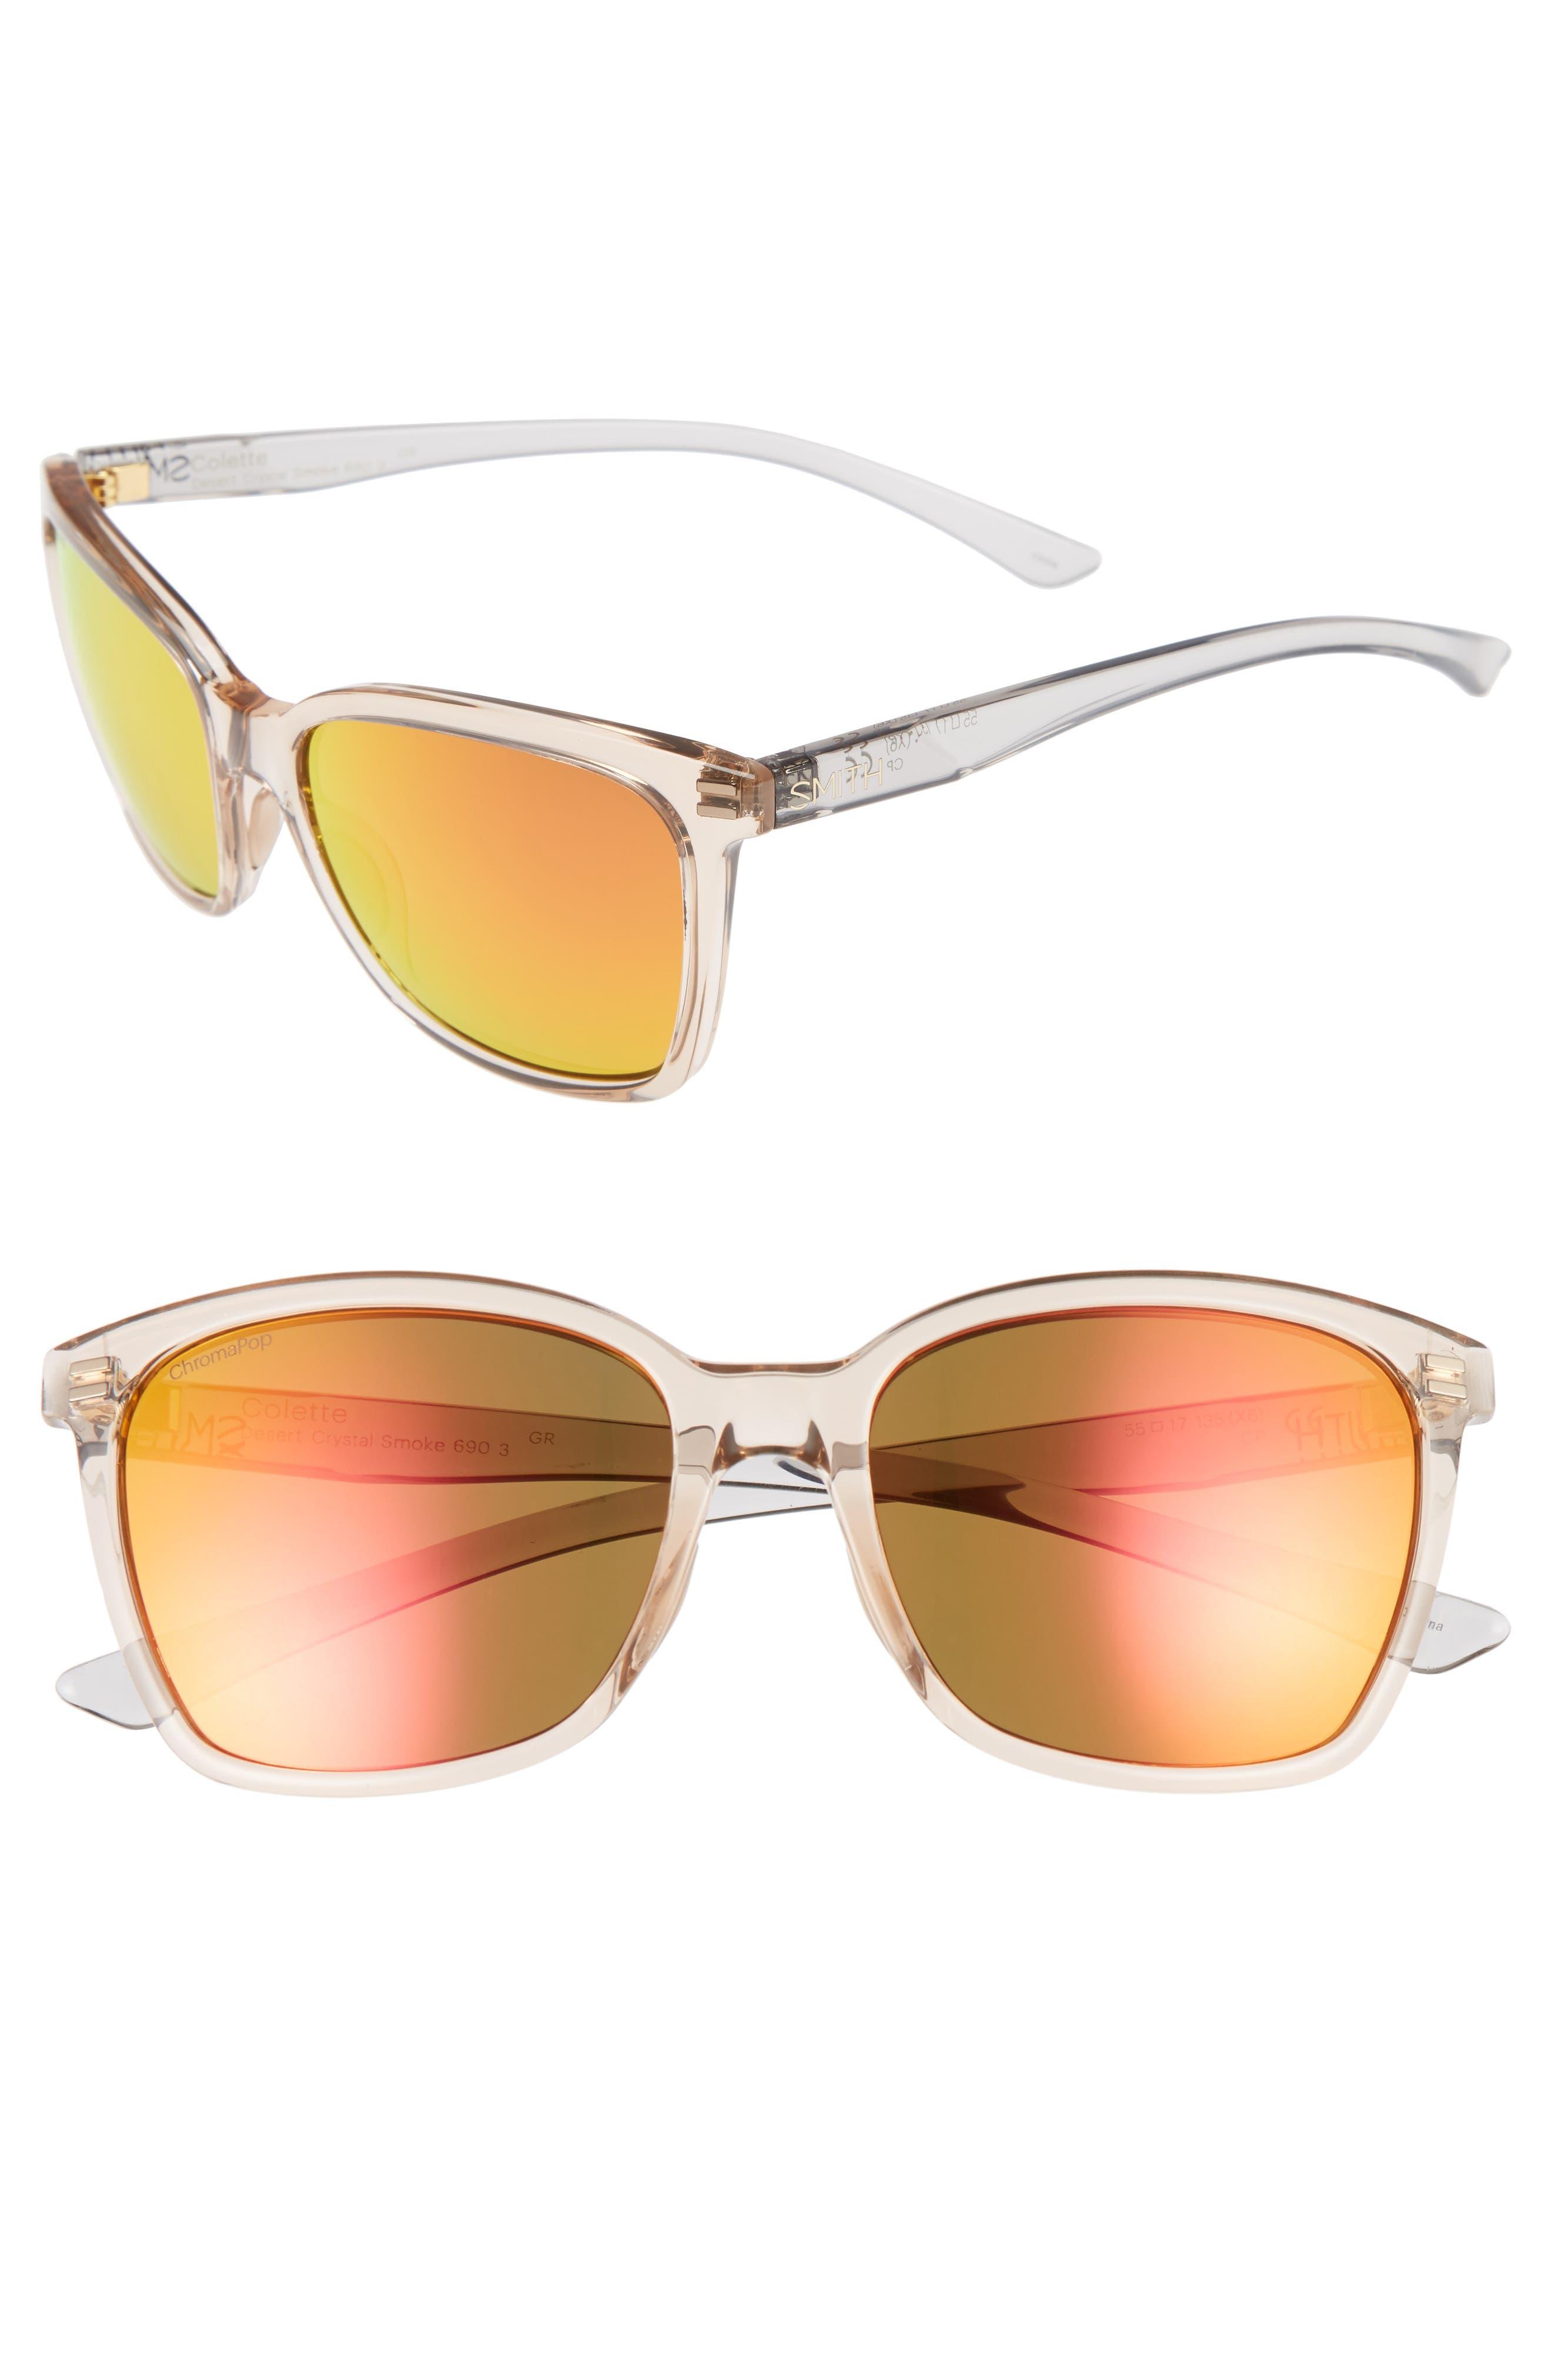 Colette Chromapop 55mm Polarized Mirrored Lens Sunglasses,                             Main thumbnail 1, color,                             Desert Crystal/ Smoke